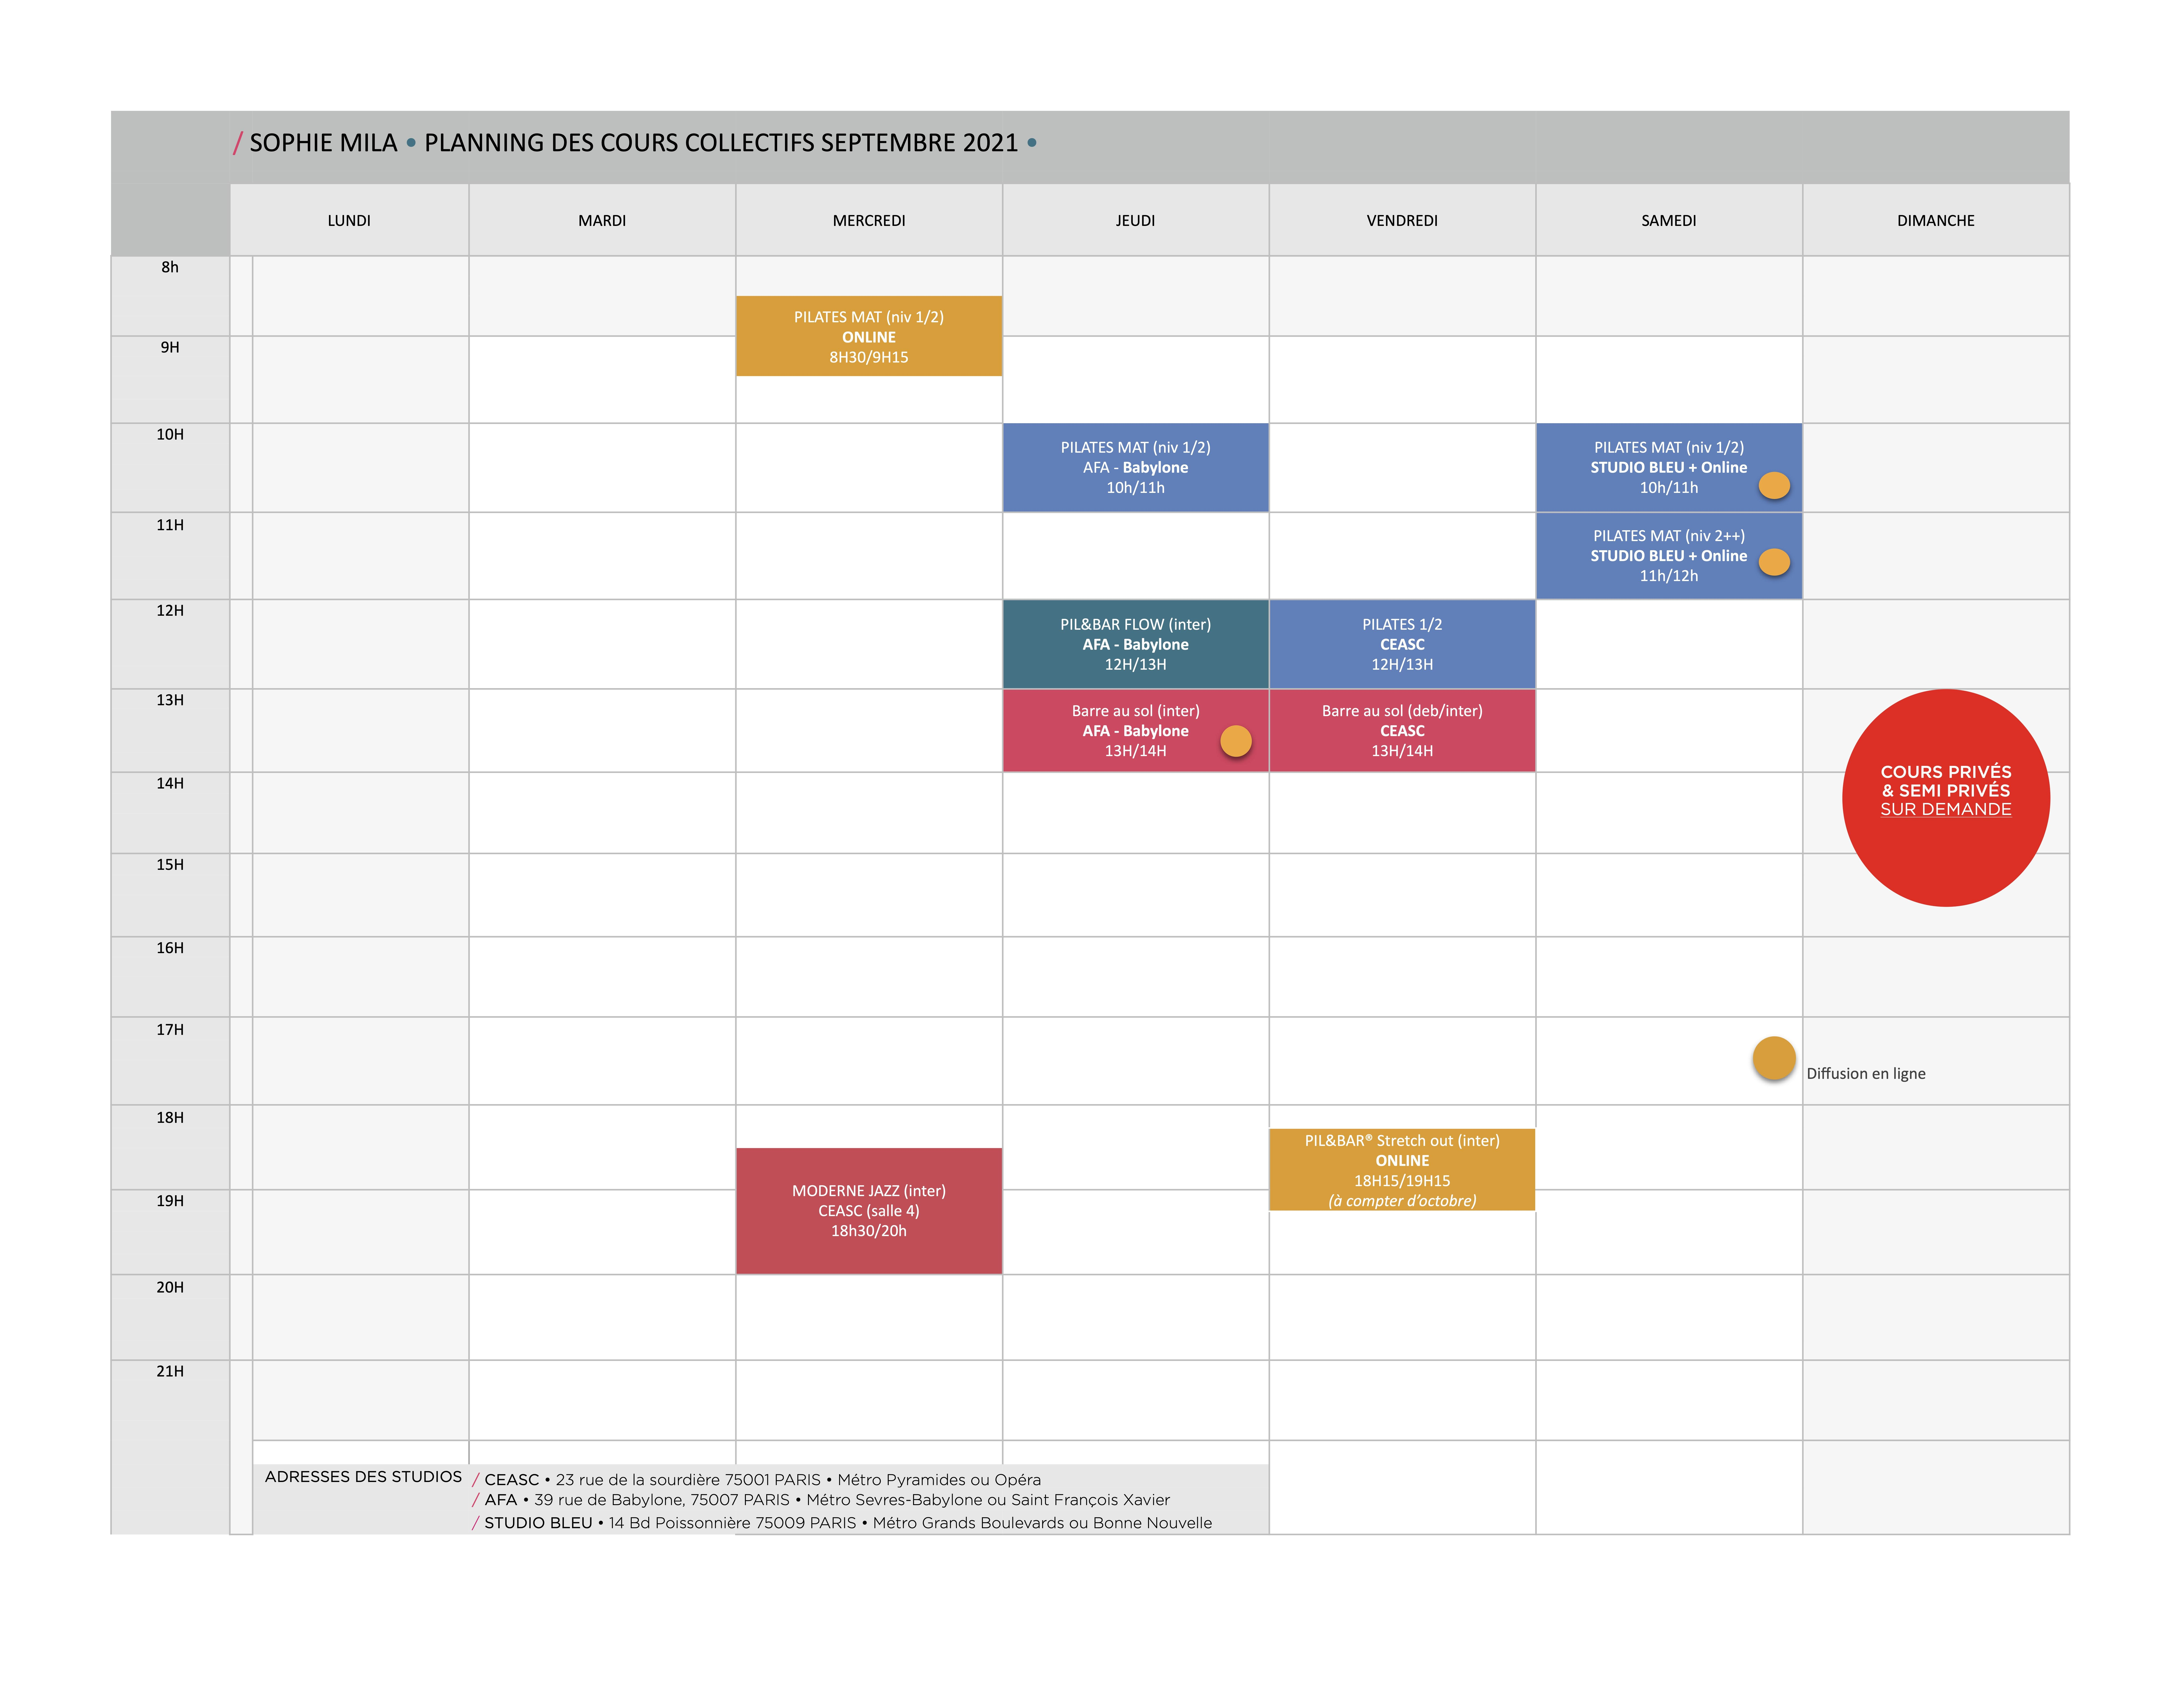 Planning cours SEPTEMBRE 2021